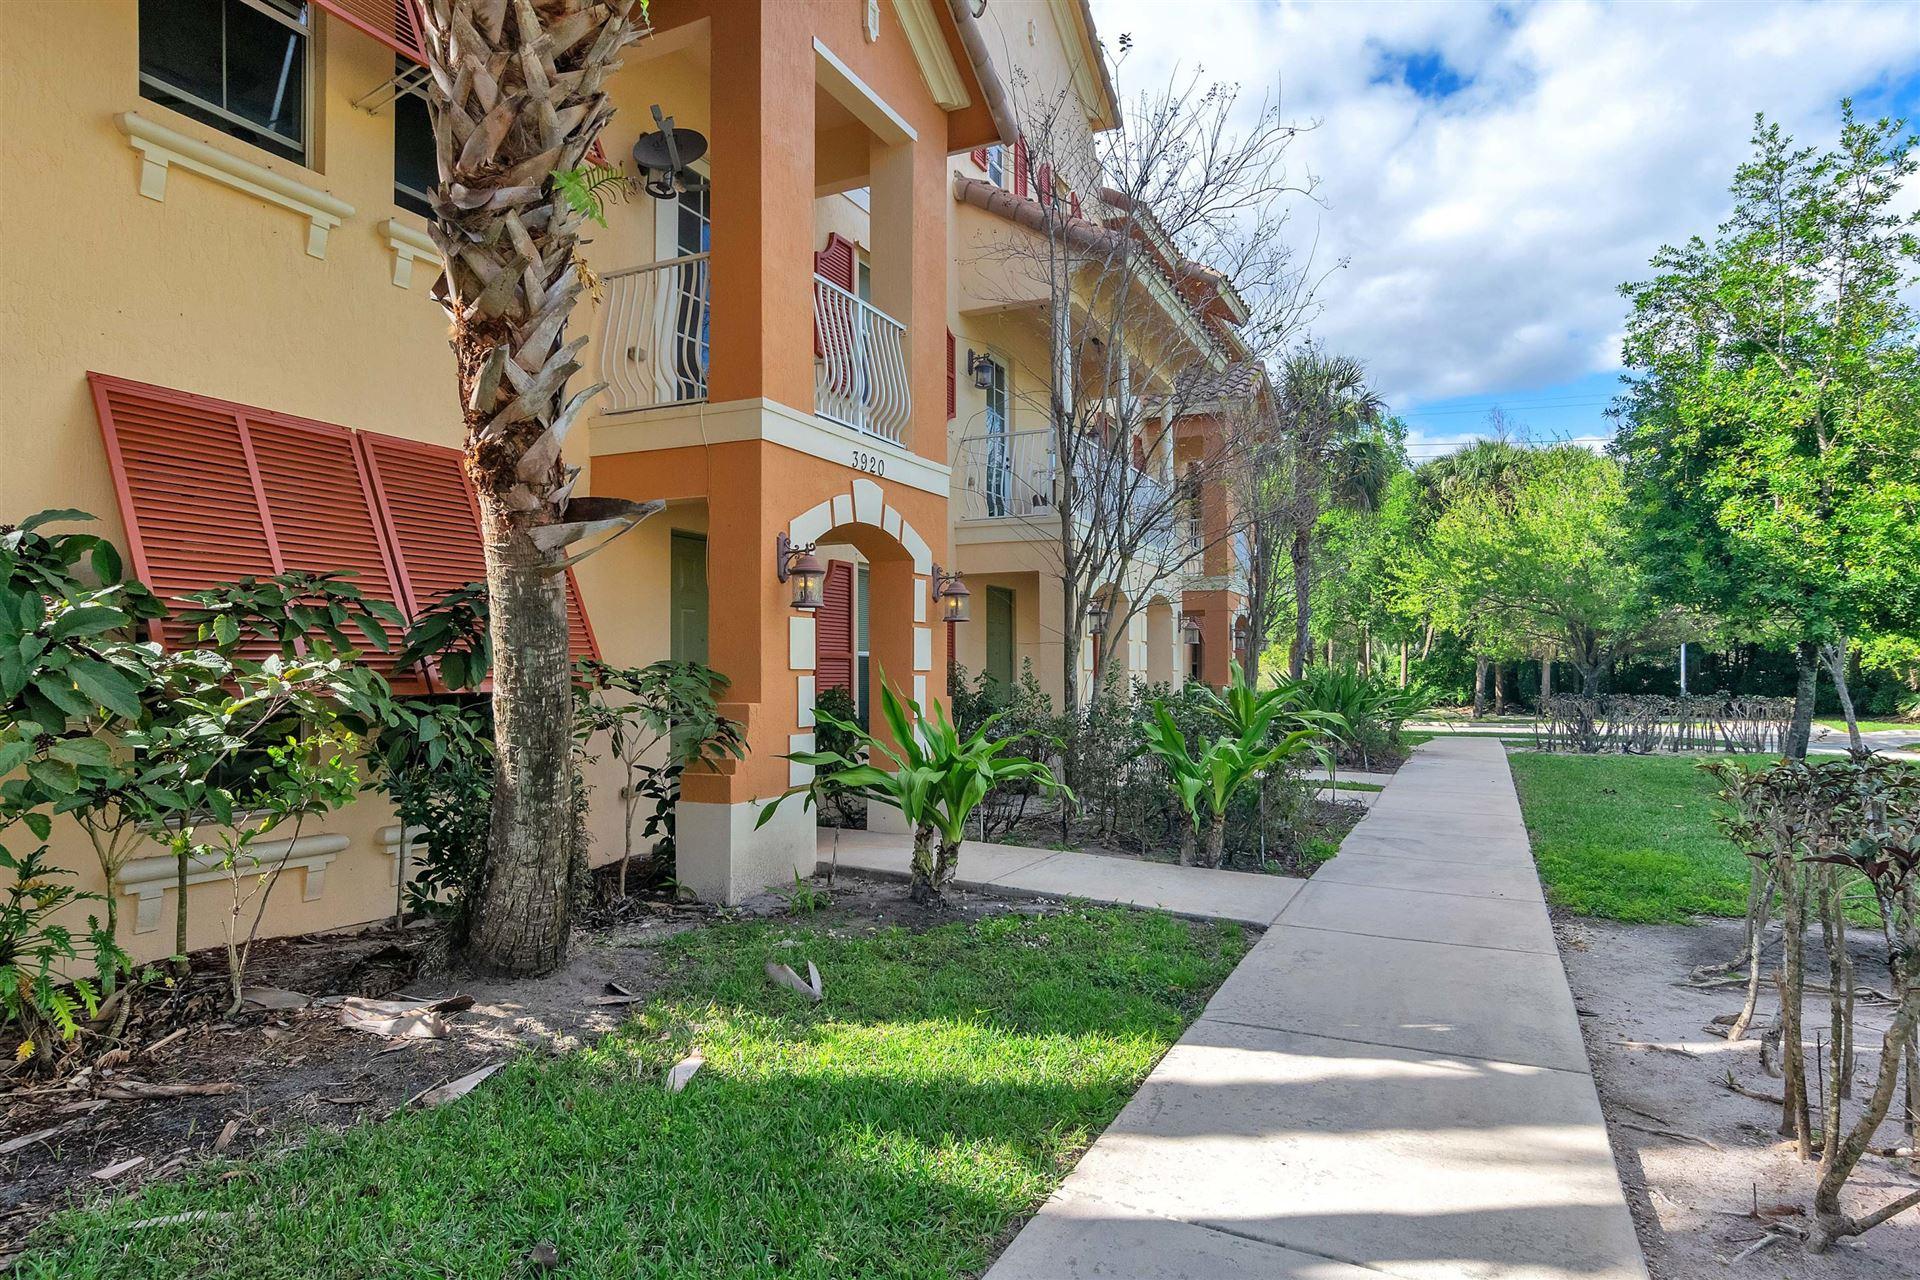 Photo of 3920 Laurel Lane, Coconut Creek, FL 33073 (MLS # RX-10698934)